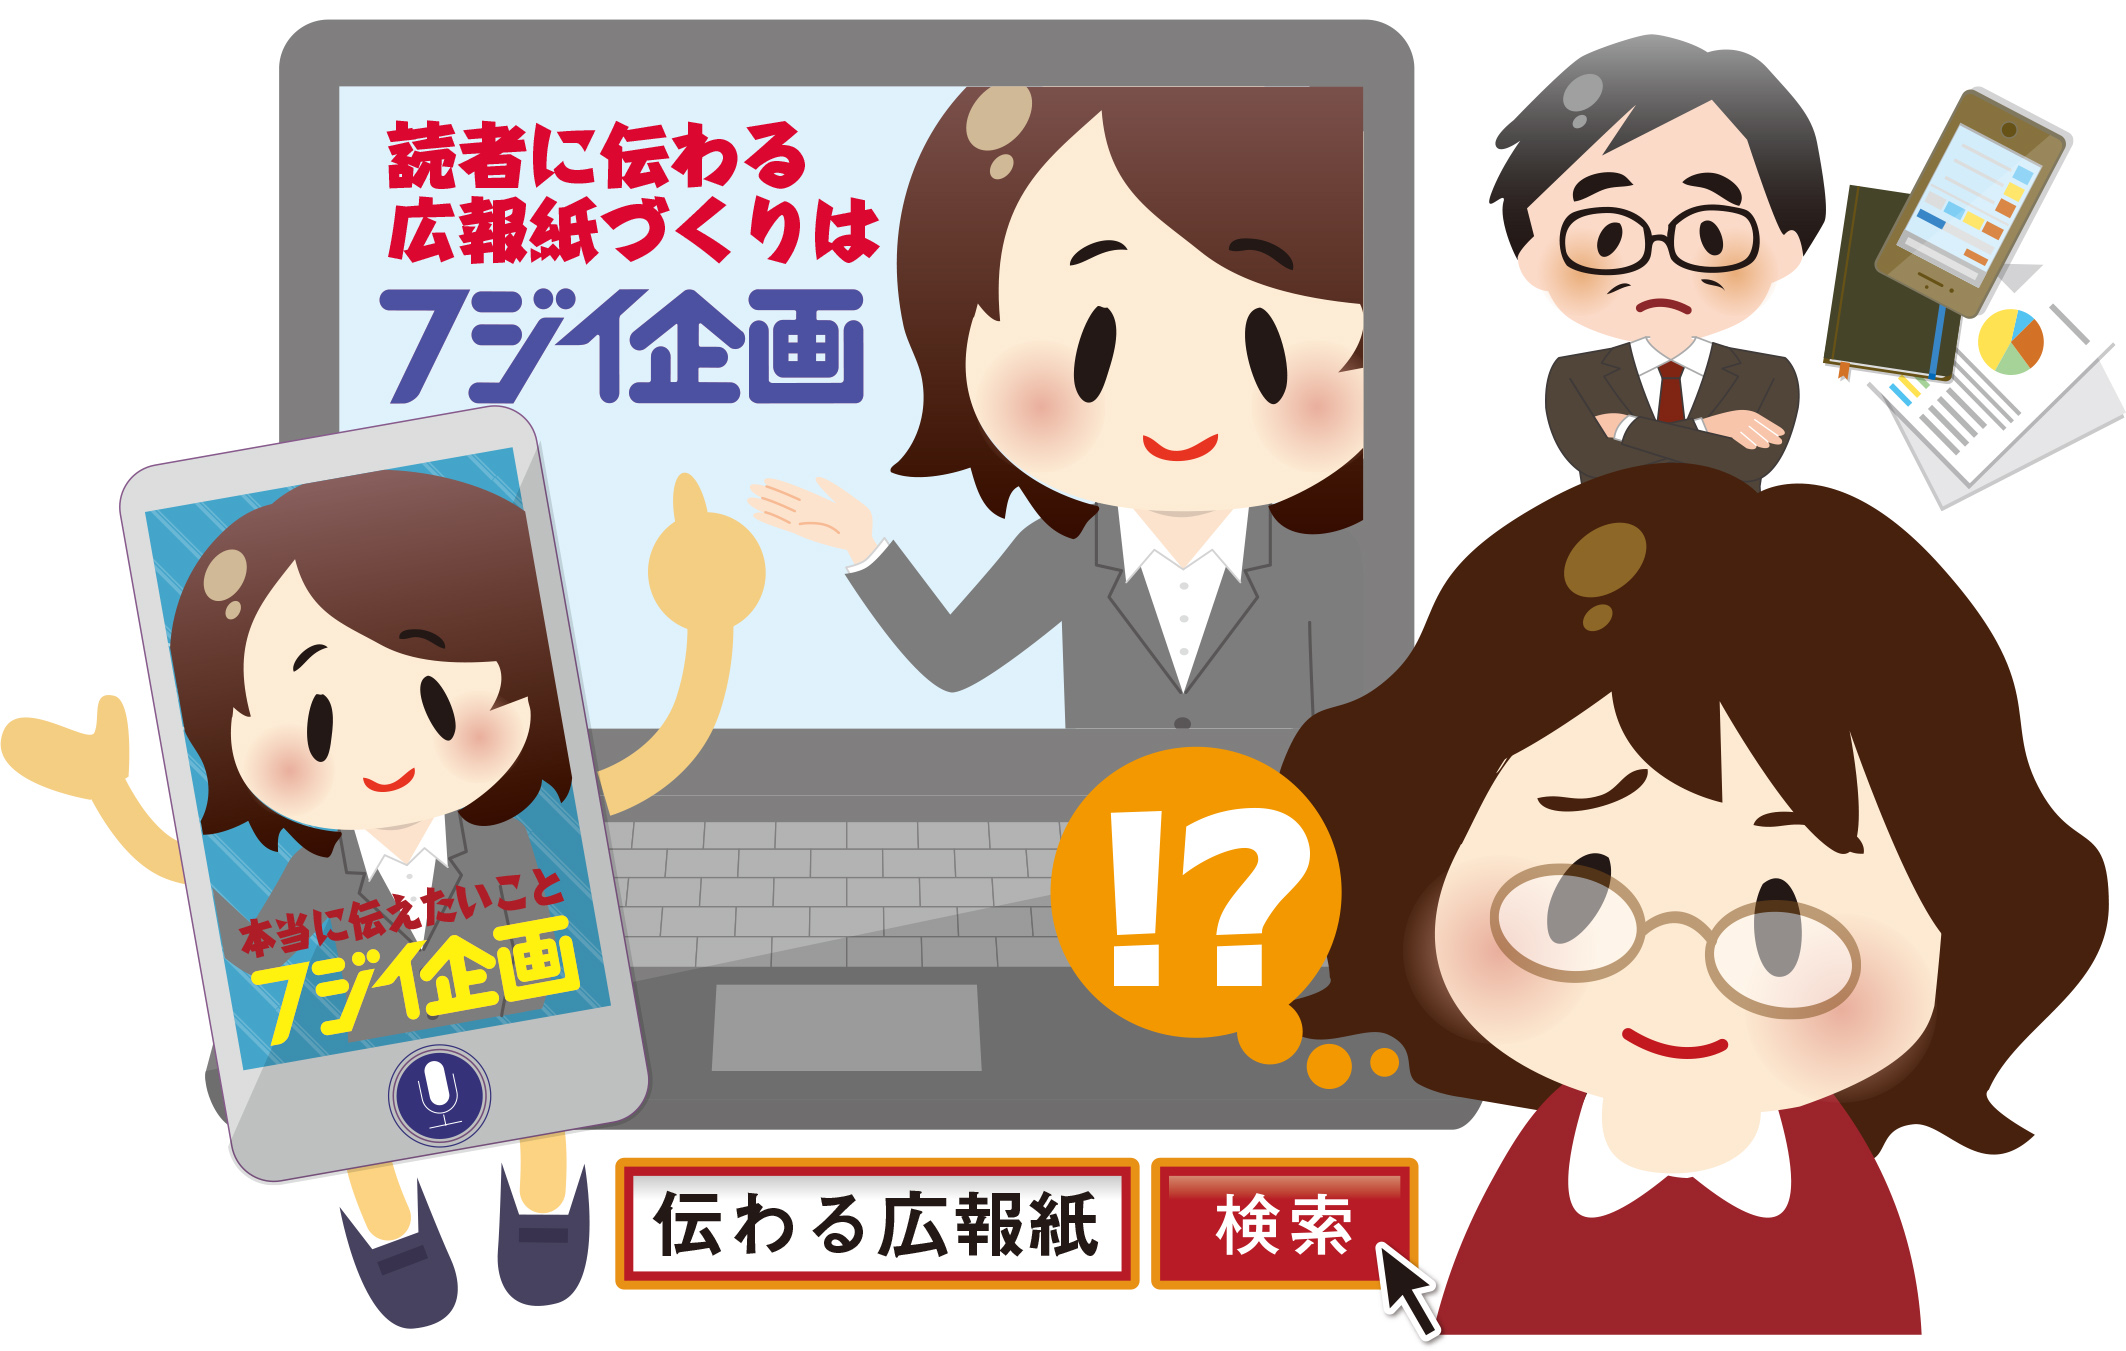 PTA新聞、会報、社報、機関紙づくり、書籍出版、広報紙コンクール入賞はフジイ企画(大阪)